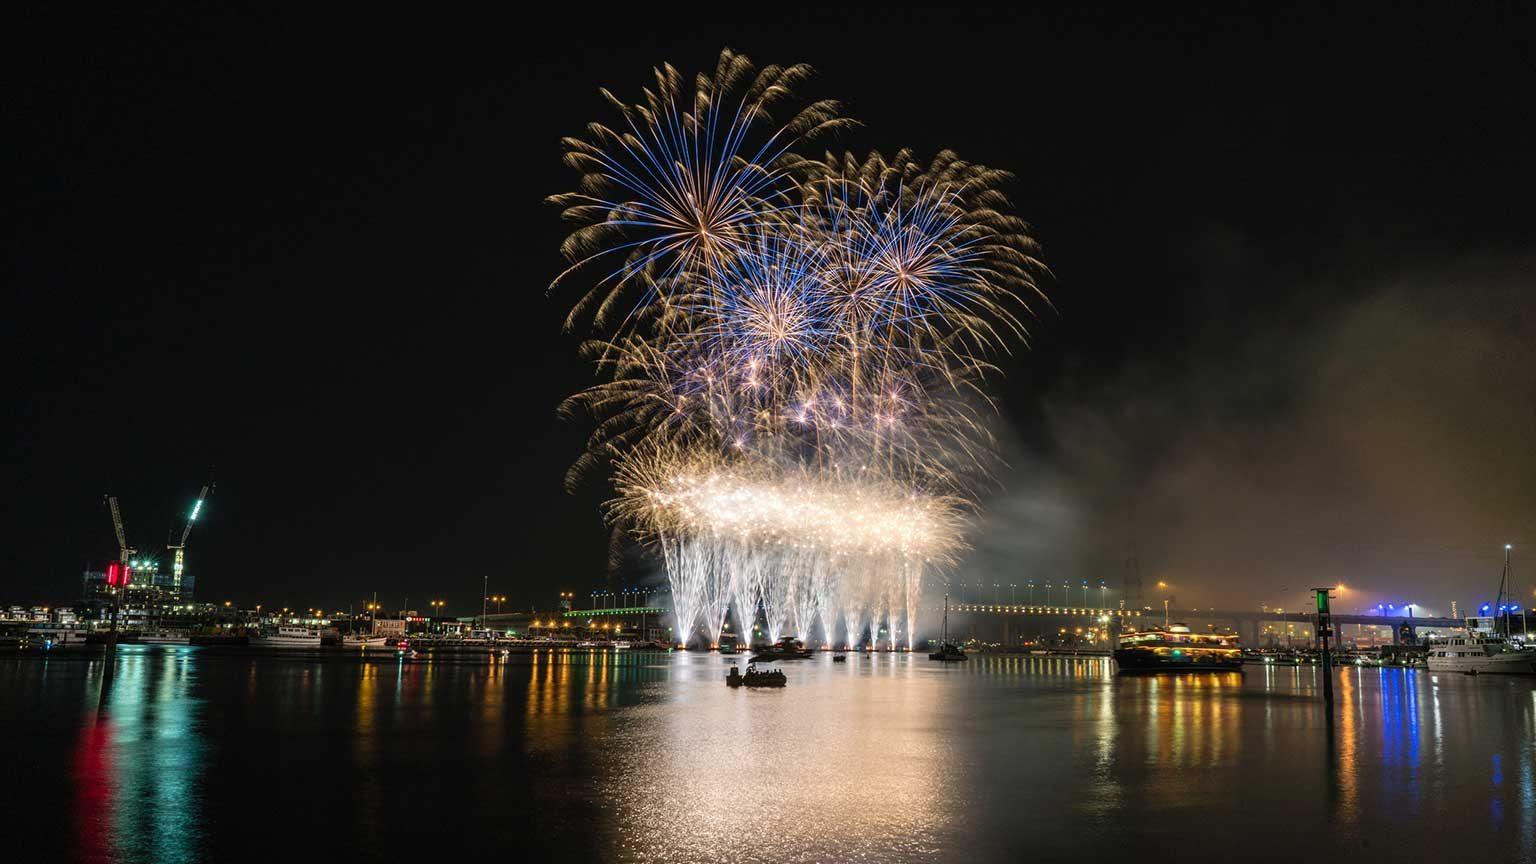 Australia Day fireworks in Melbourne.